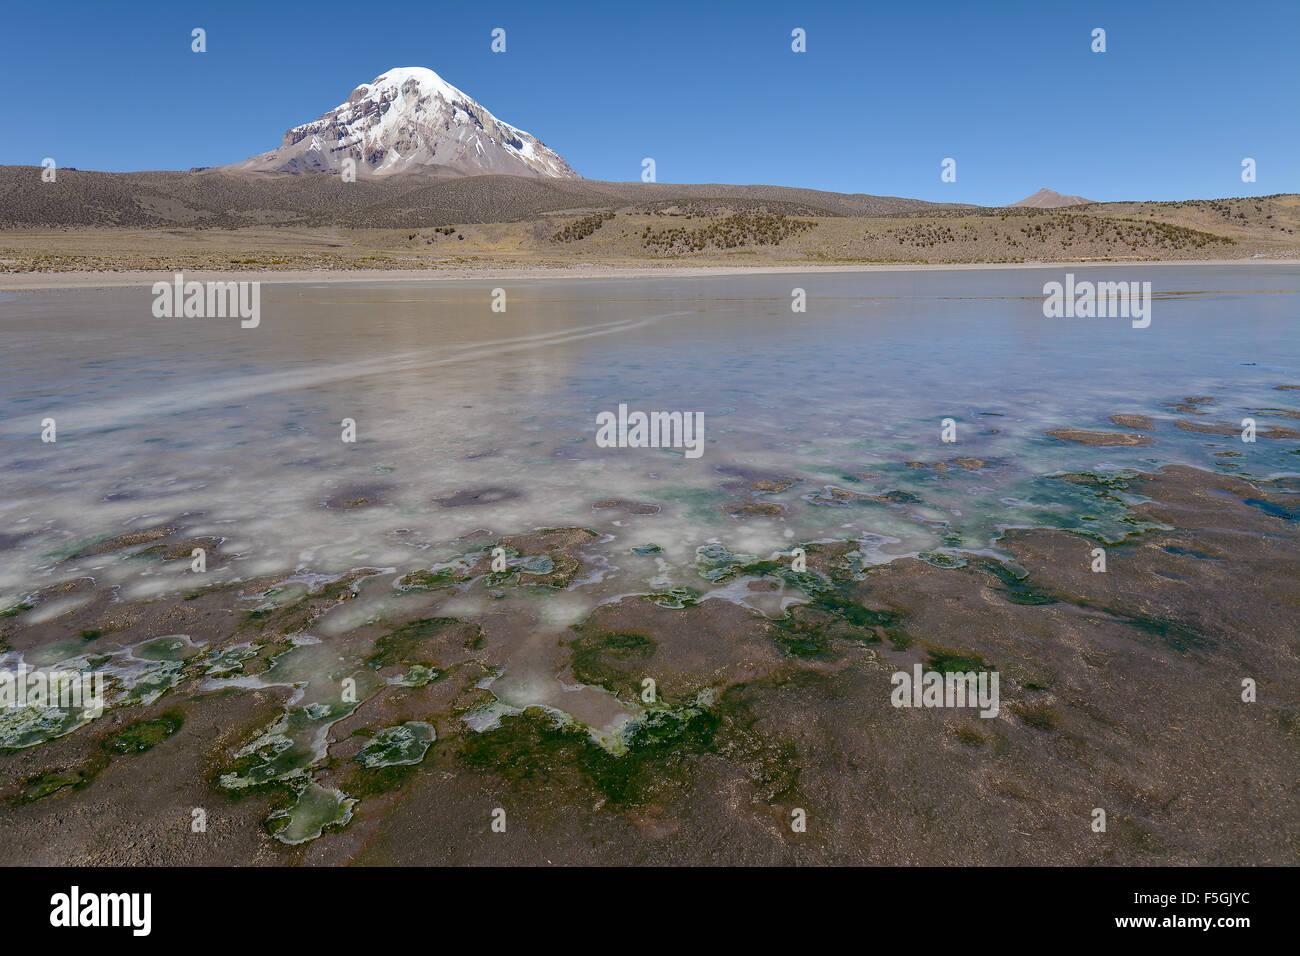 Sajama Volcano and frozen lake on Rio Sajama, Sajama National Park, Oruro, border between Bolivia and Chile - Stock Image